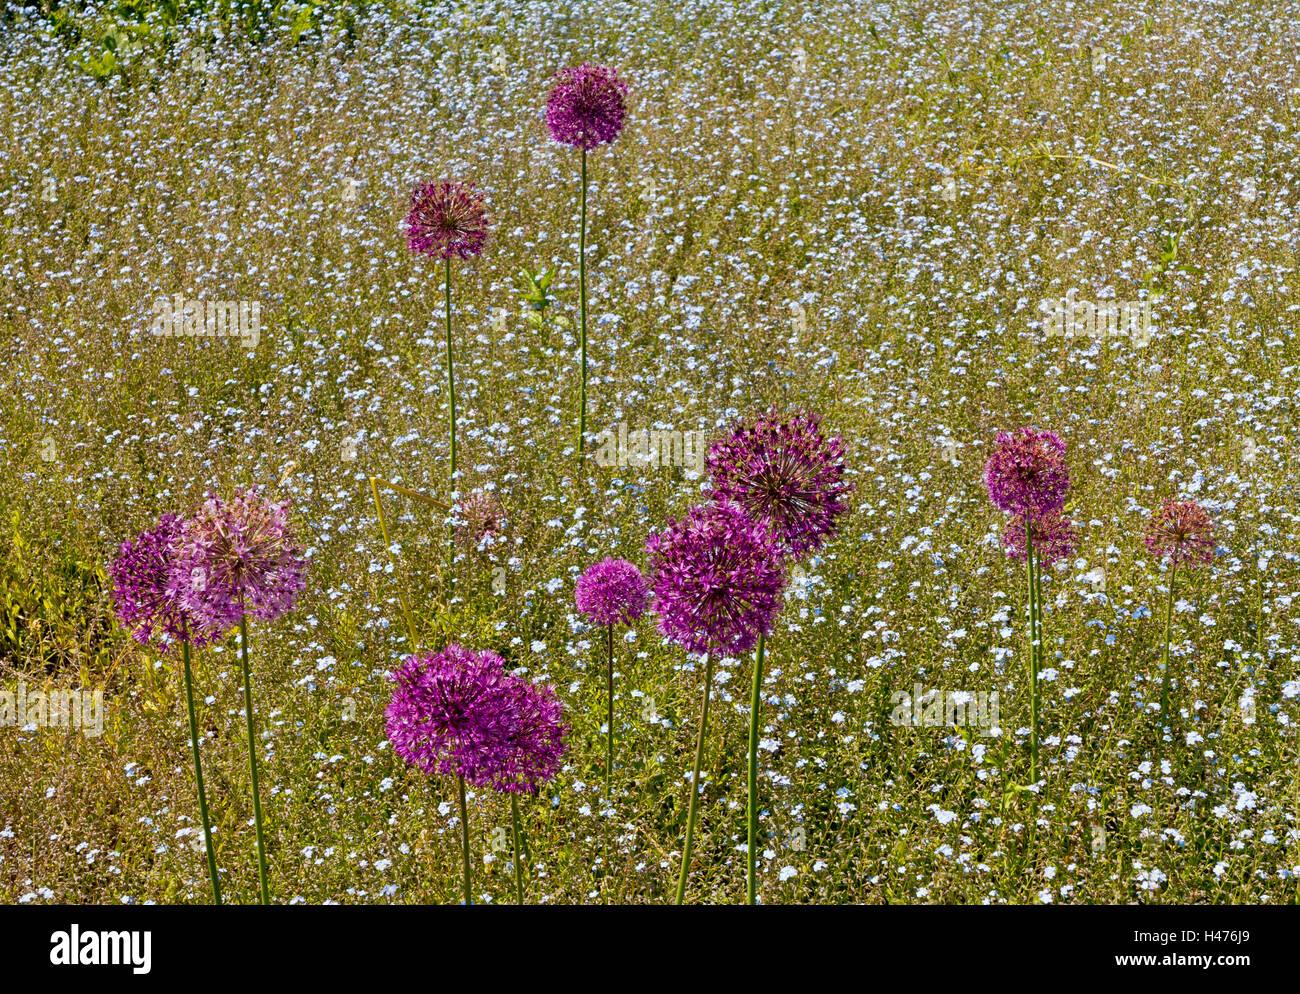 Purple allium flowers growing in a garden in early summer a genus of monocotyledonous flowering plants - Stock Image